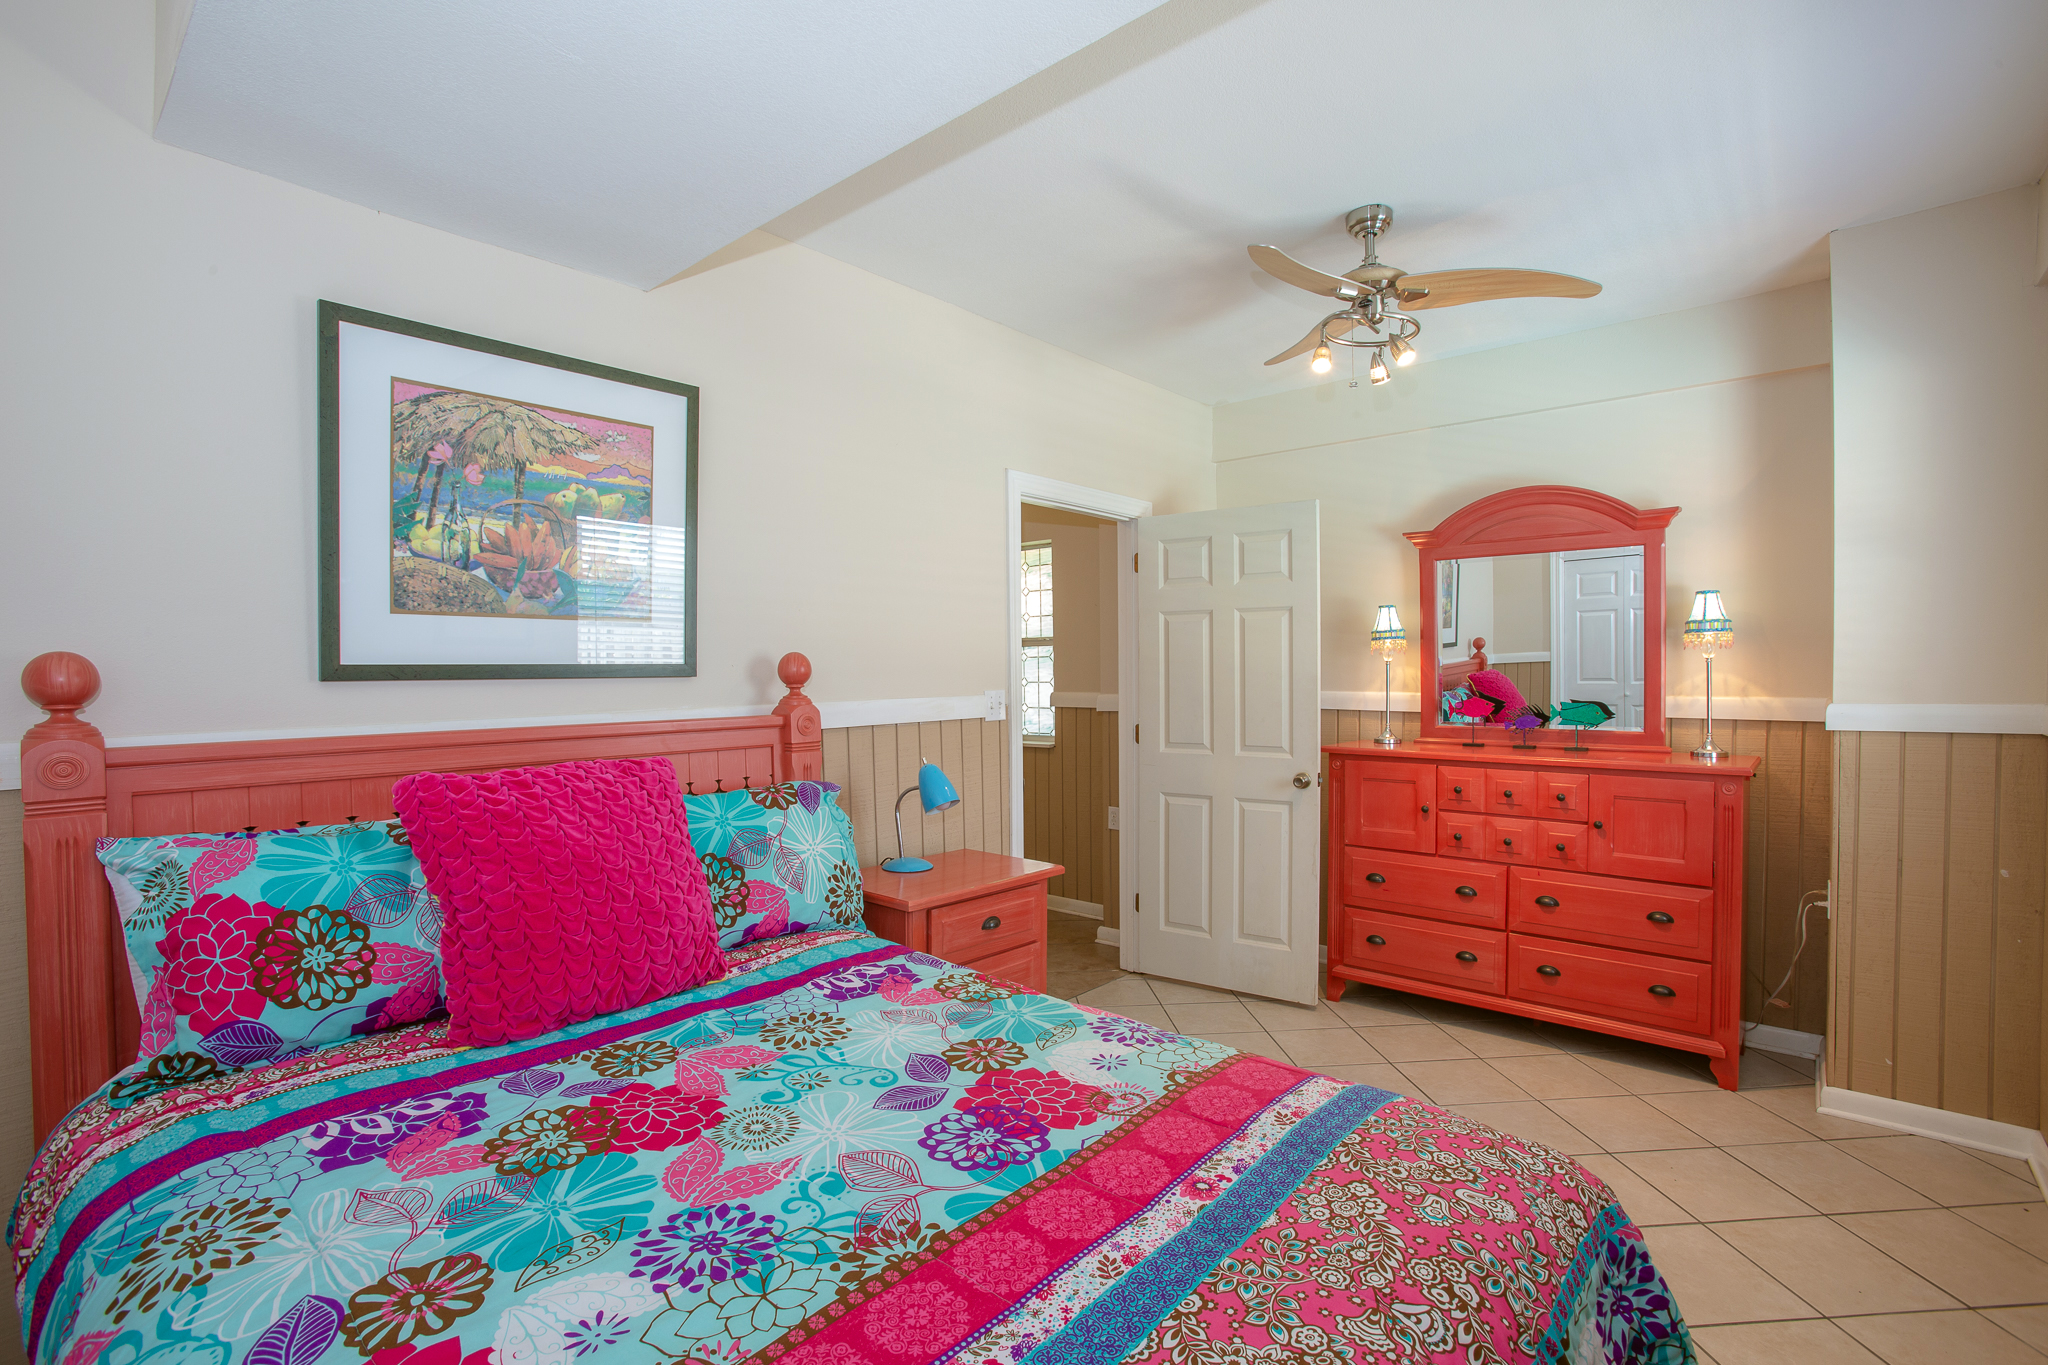 Maldonado 1015 - Sea the Big Picture House/Cottage rental in Pensacola Beach House Rentals in Pensacola Beach Florida - #27